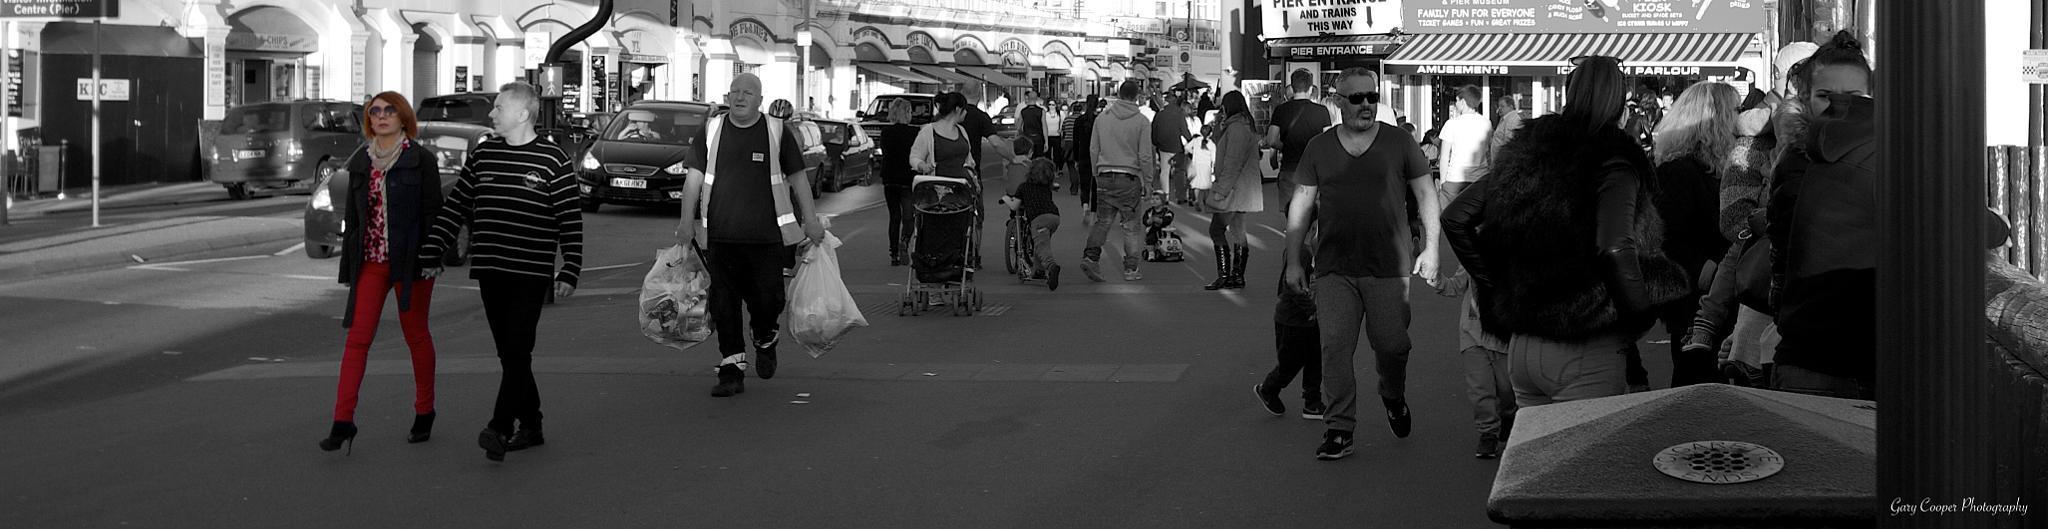 Summer Stroll by Gary Cooper